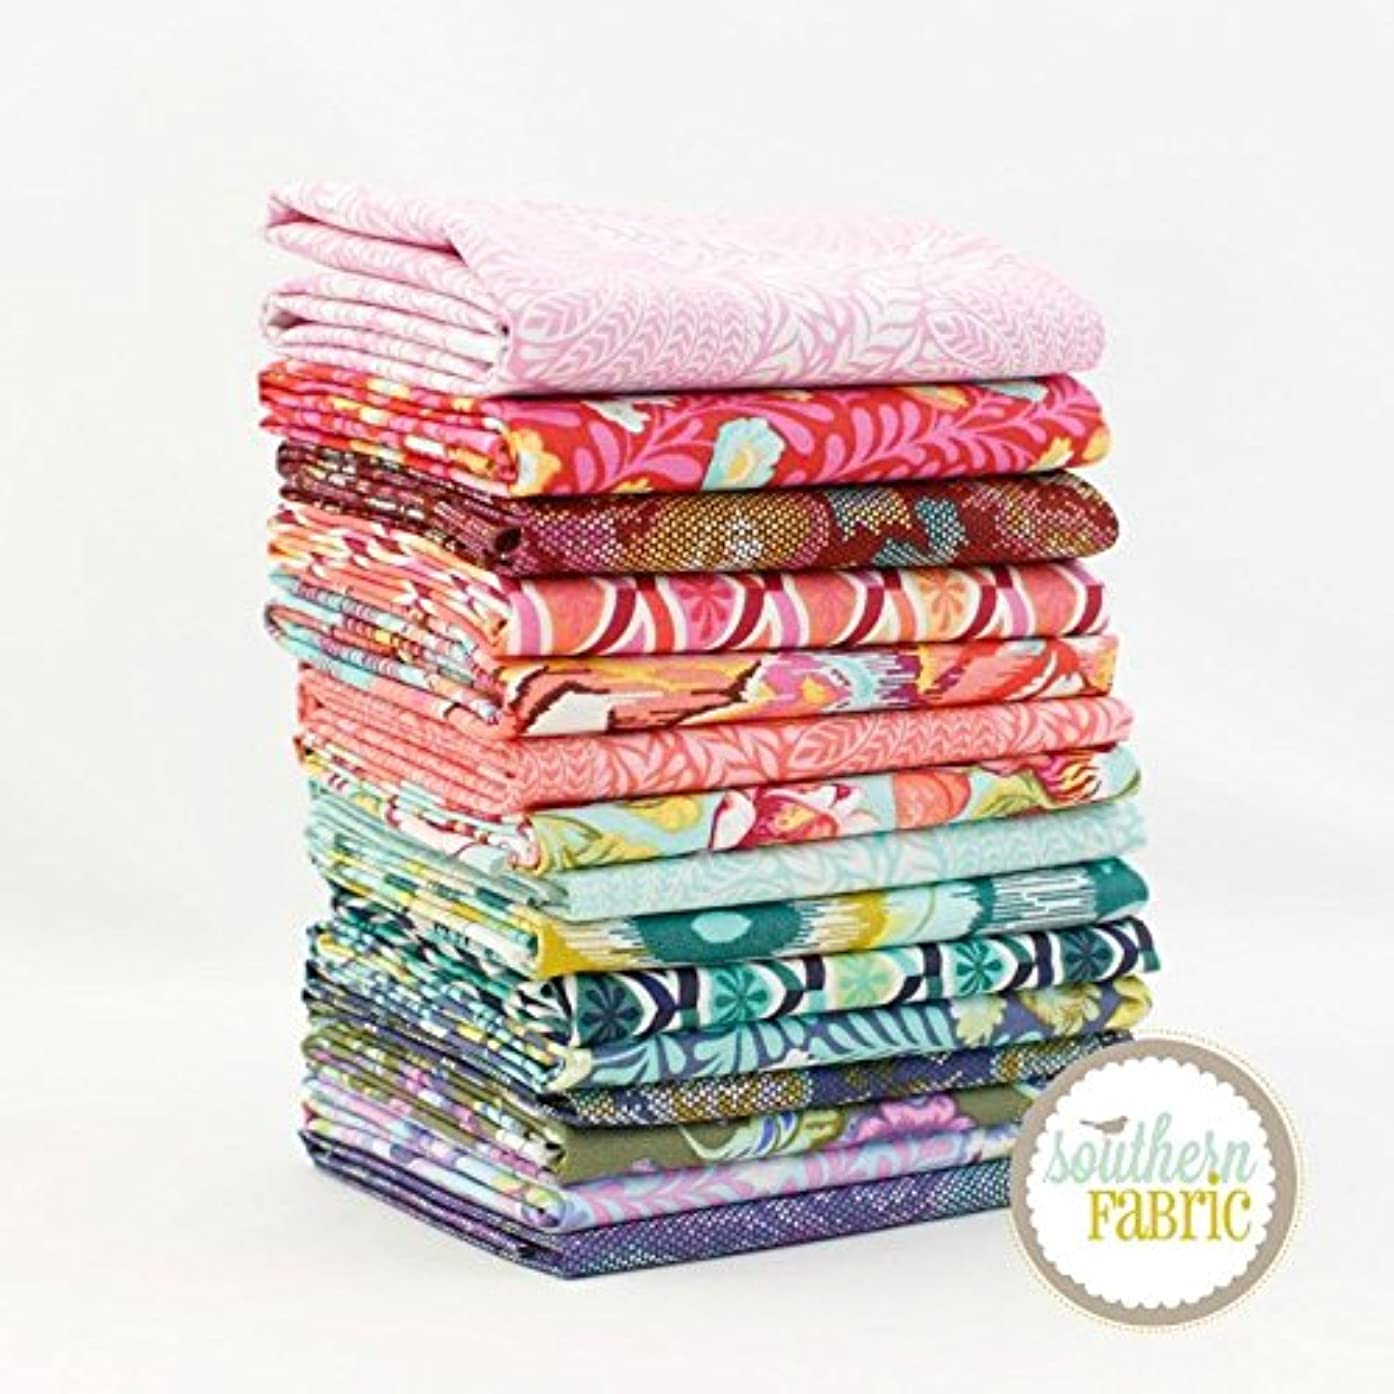 Eden Fat Quarter Bundle (15 pcs) - Tula Pink - Free Spirit 18 x 21 inches (45.72cm x 53.34cm) fabric cuts DIY quilt fabric